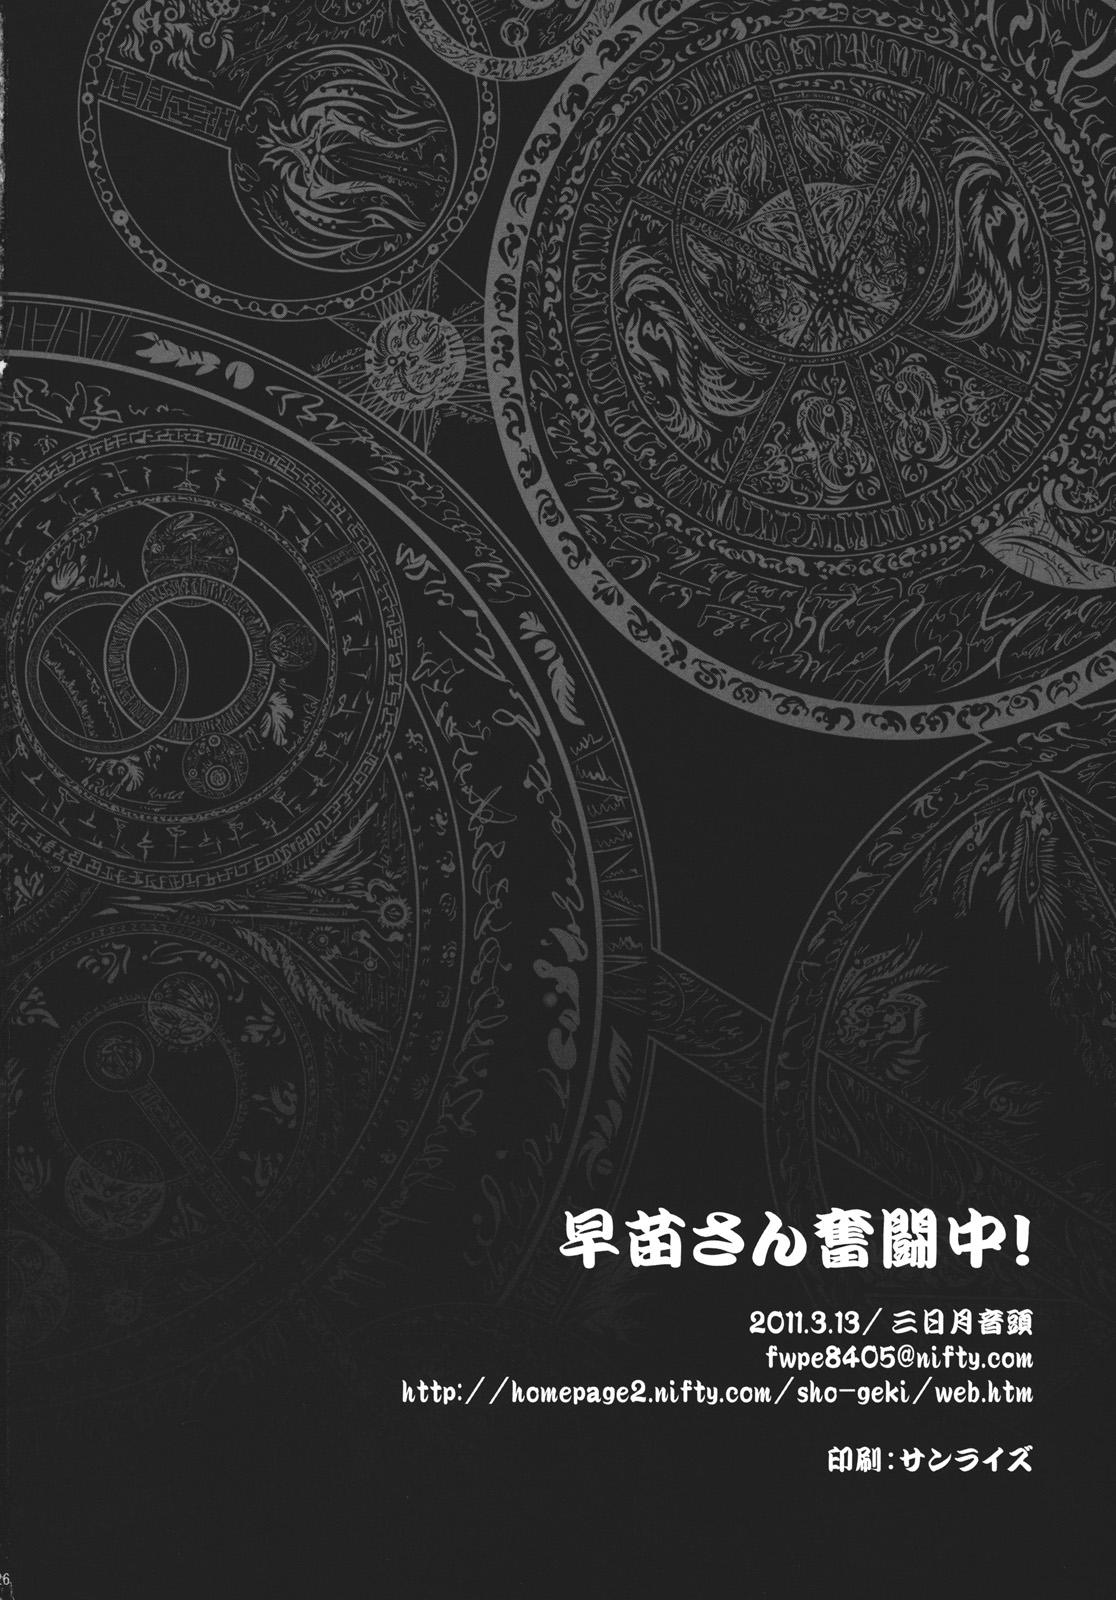 Sanae-san funtouzhu! 25